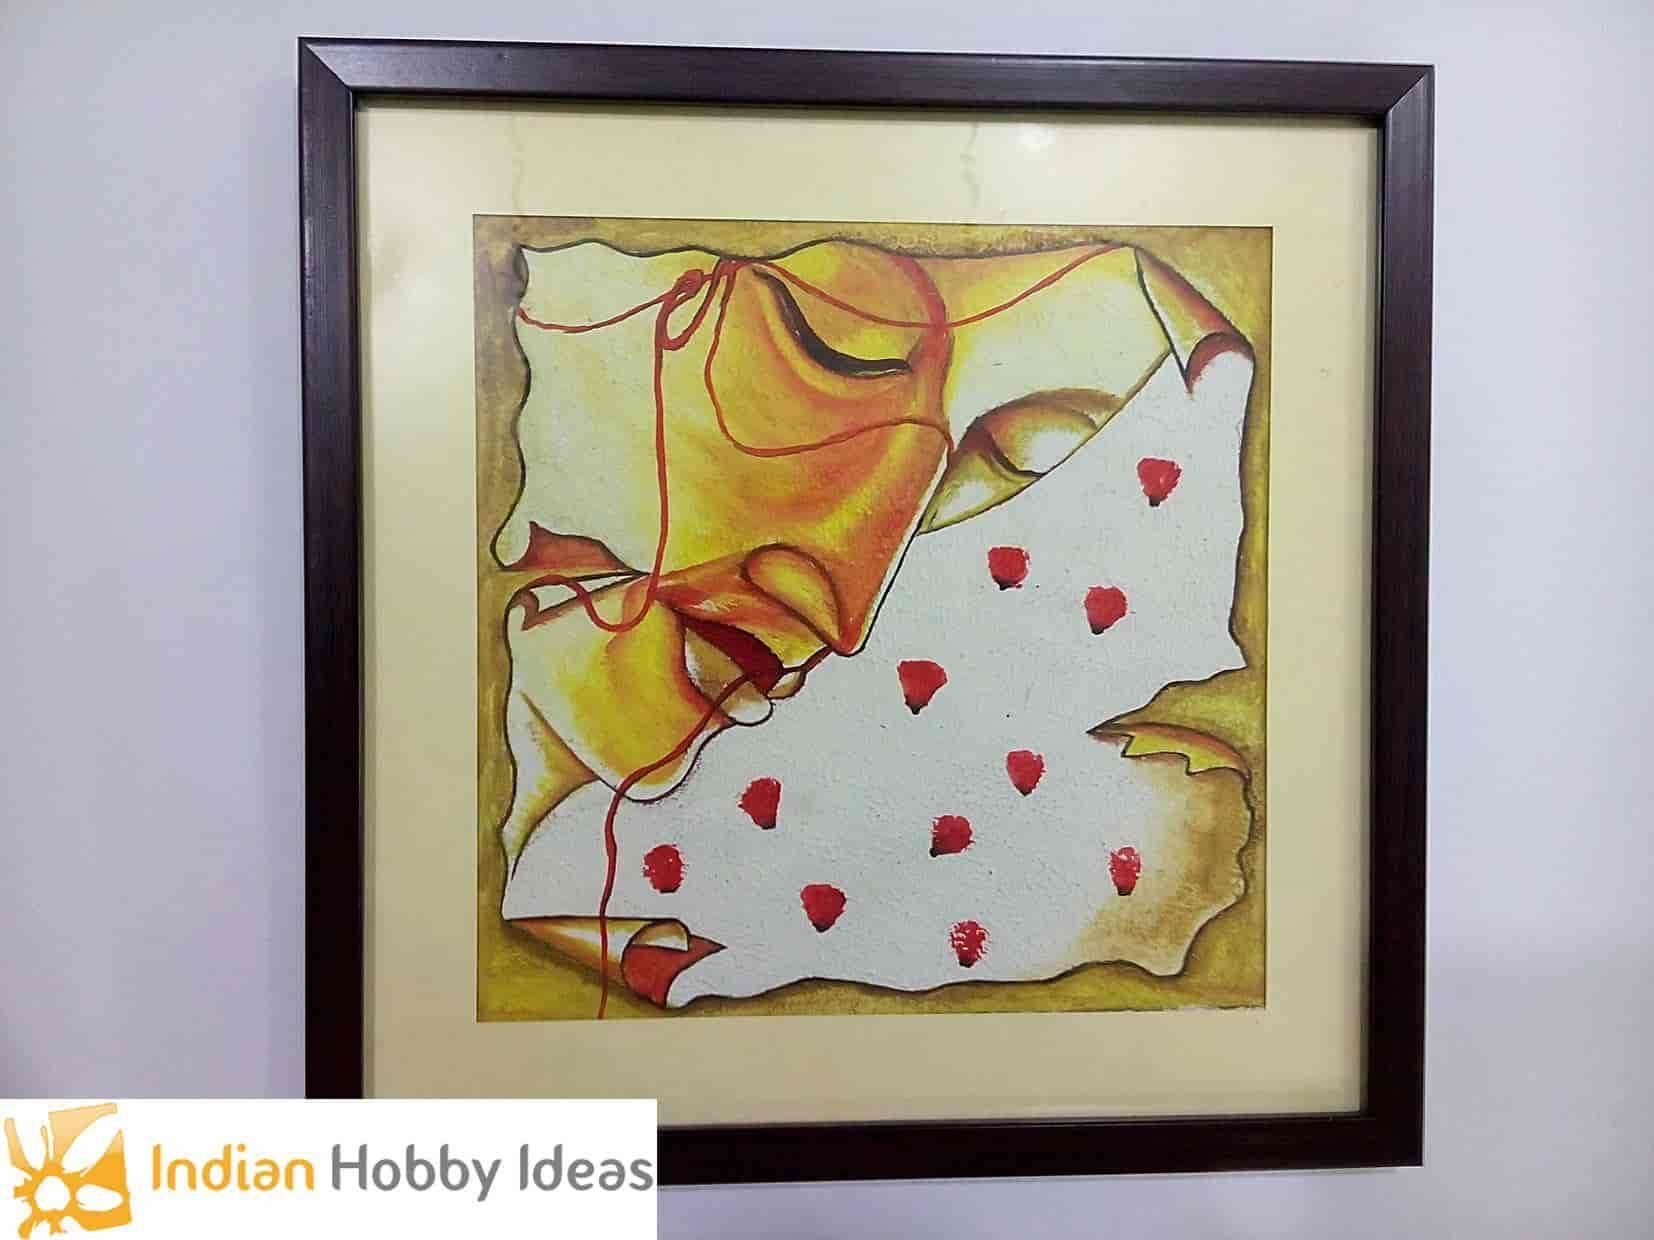 Indian Hobby Ideas Paschim Vihar